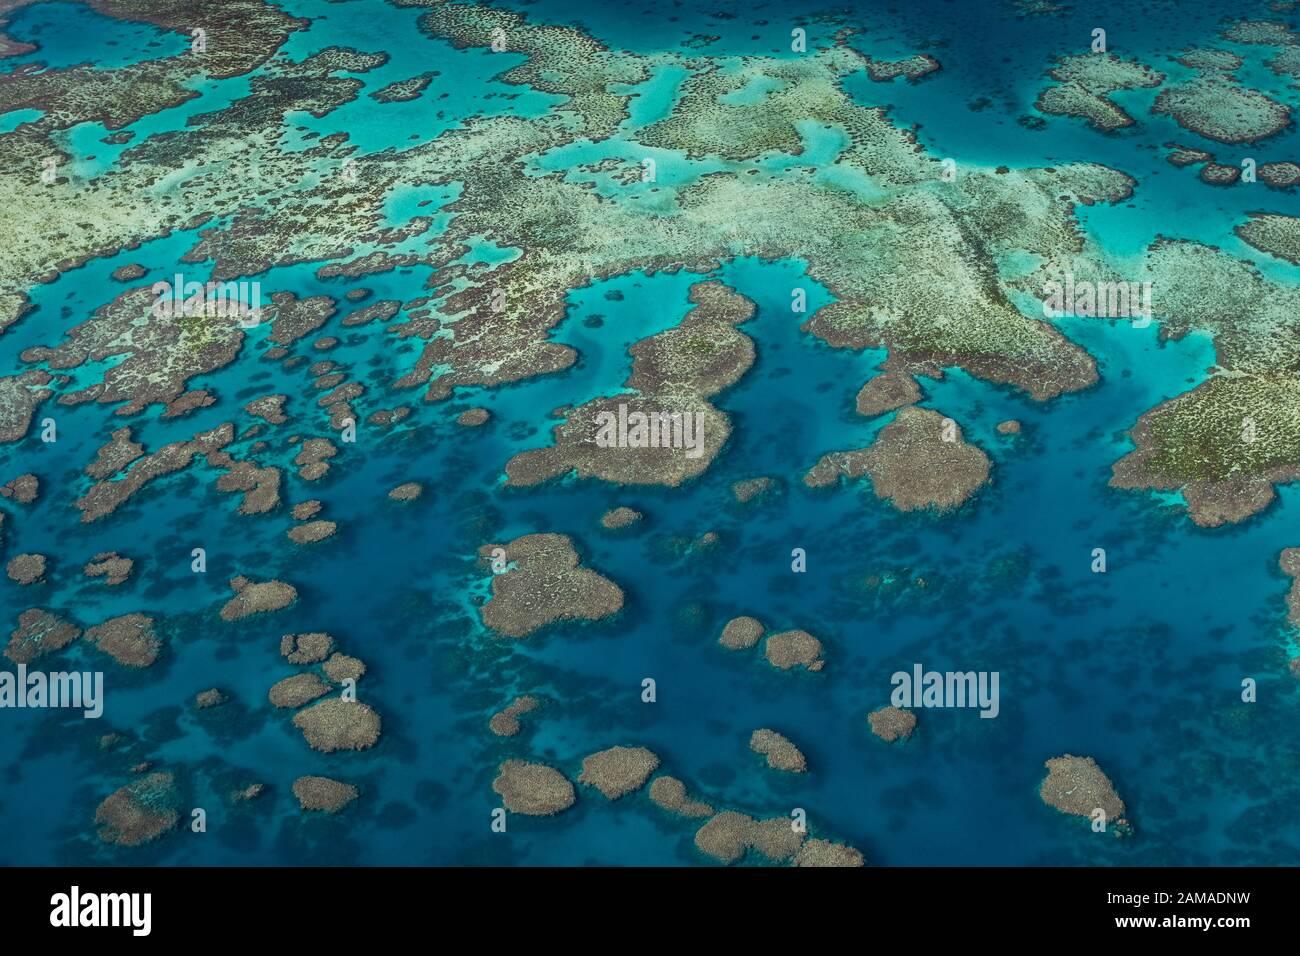 Luftaufnahme des berühmten Great Barrier Reef. Stockfoto